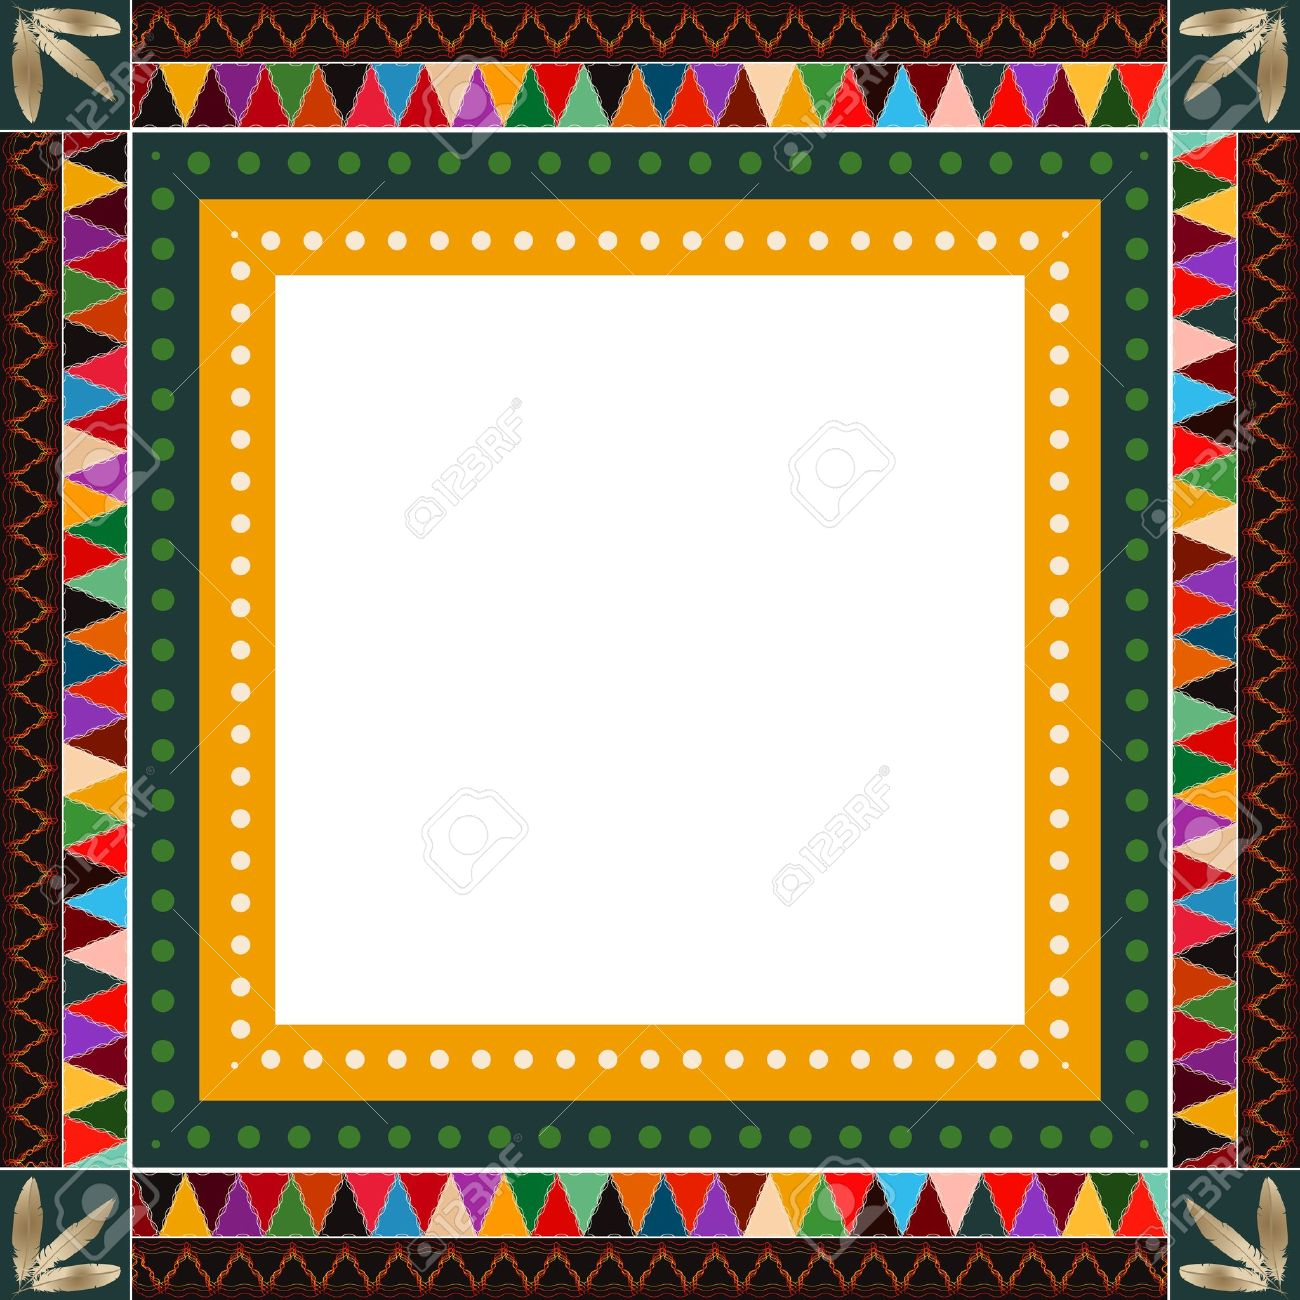 Native American clipart native african Native Style Clipart Native clipart